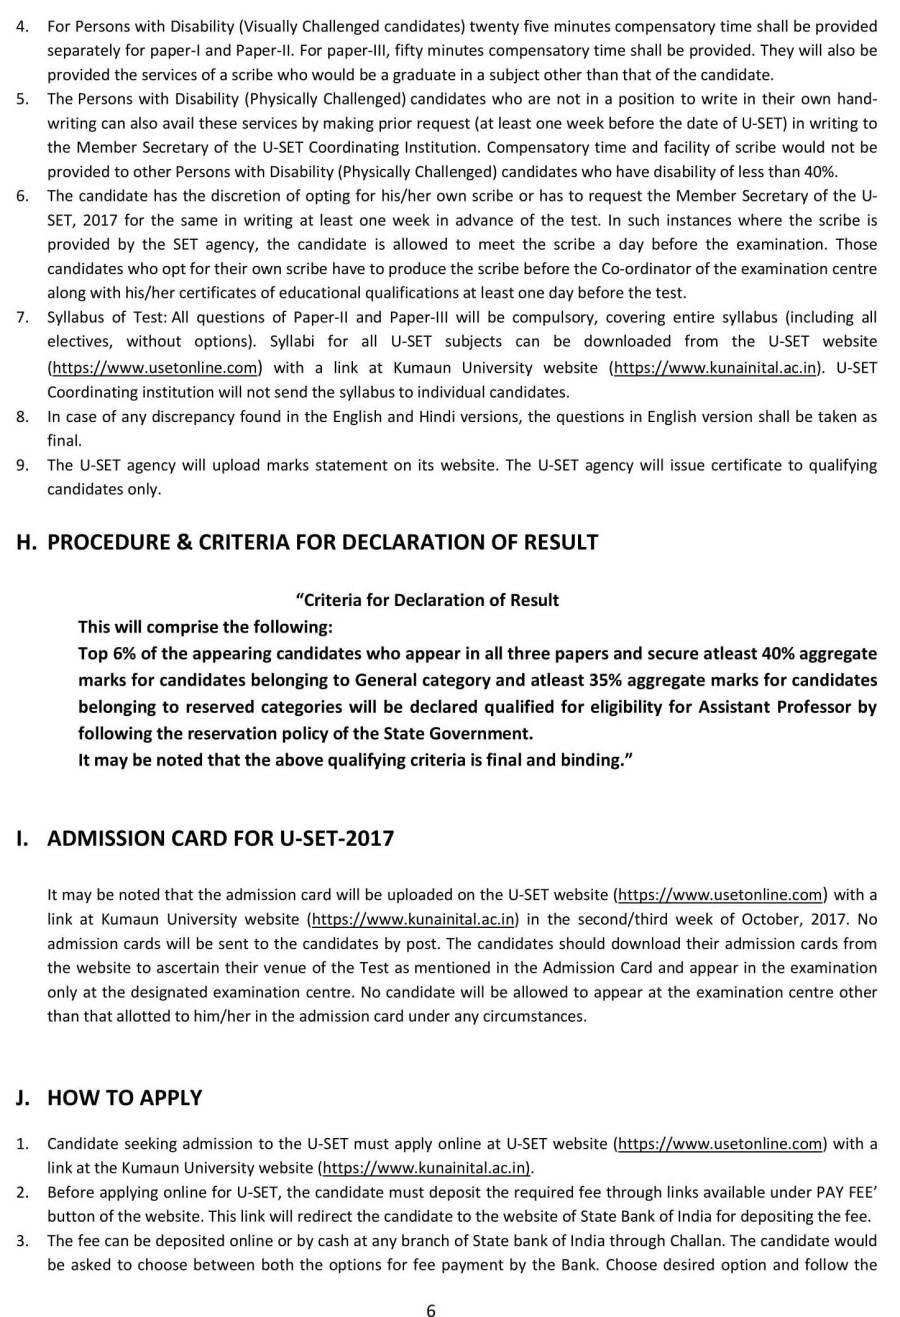 II-Information Brochure-2017_22.08.2017-6.jpg